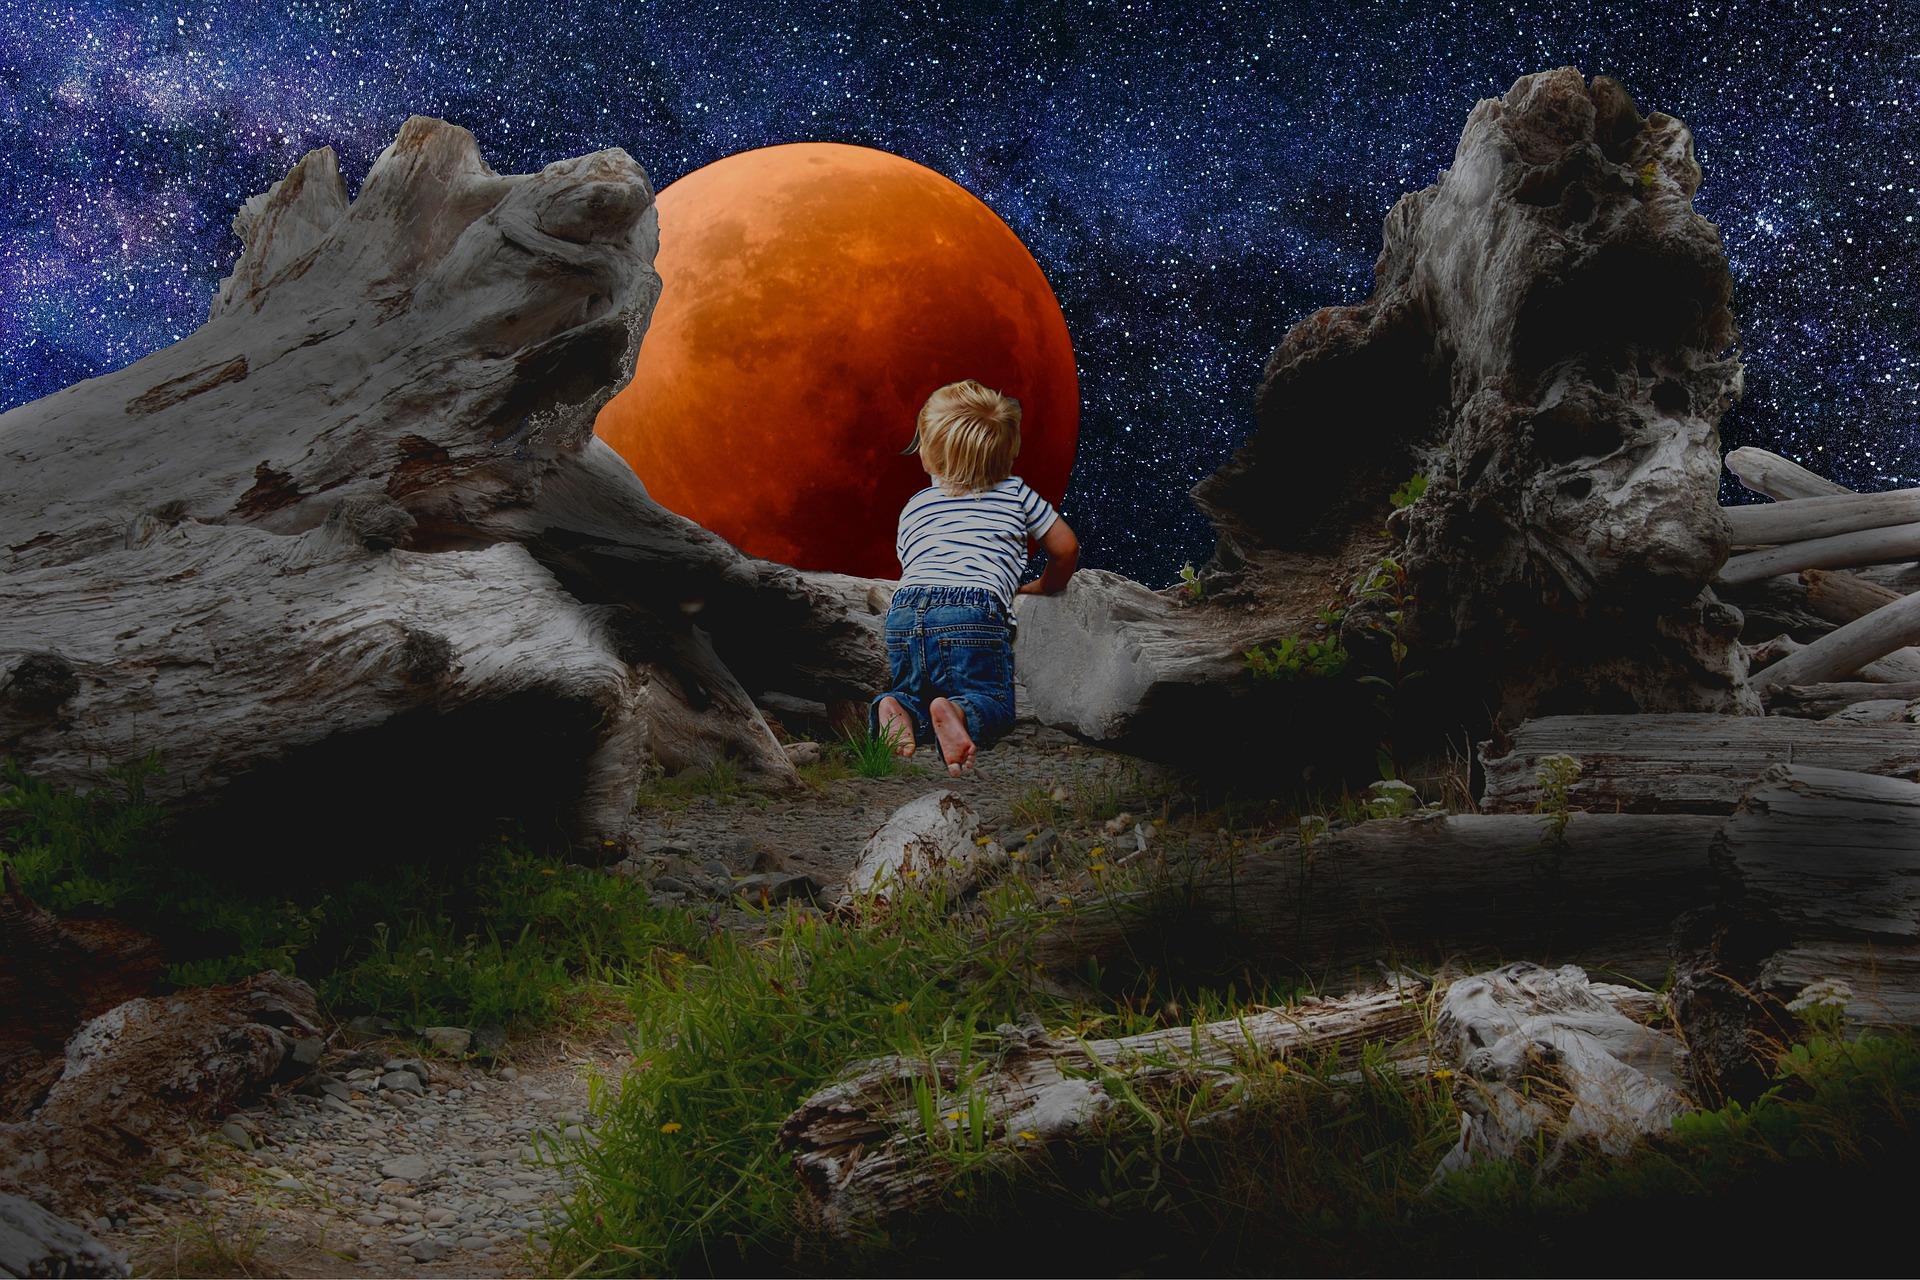 luna plina somn - sfatulparintilor.ro - pixabay_com - mati-3114955_1920